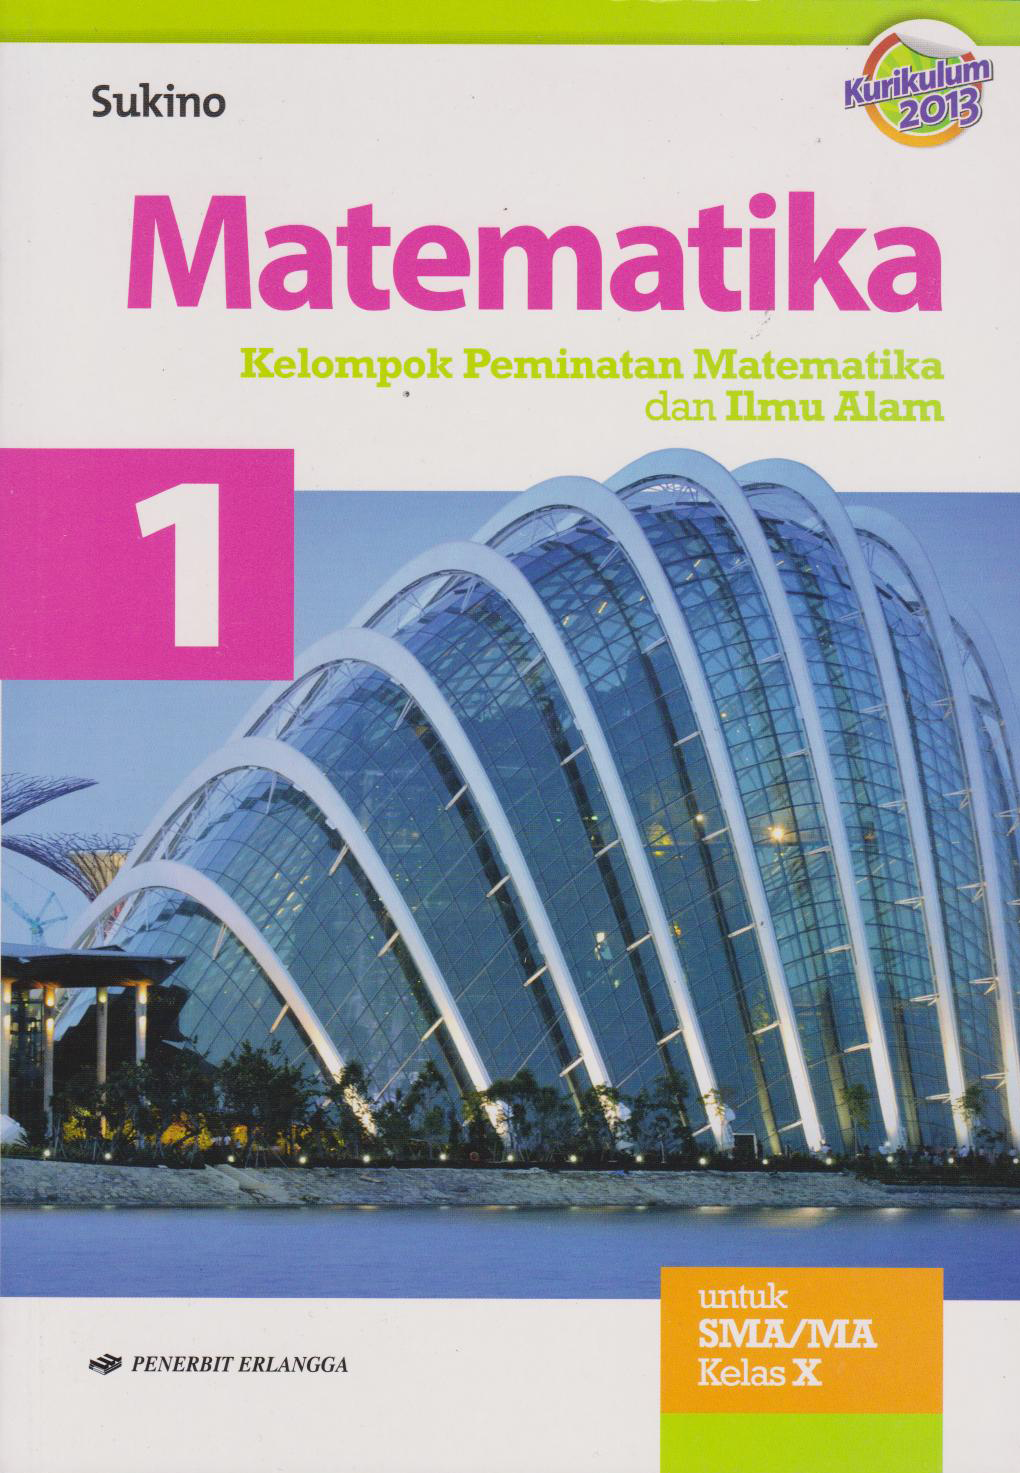 Buku Matematika Sma Pdf